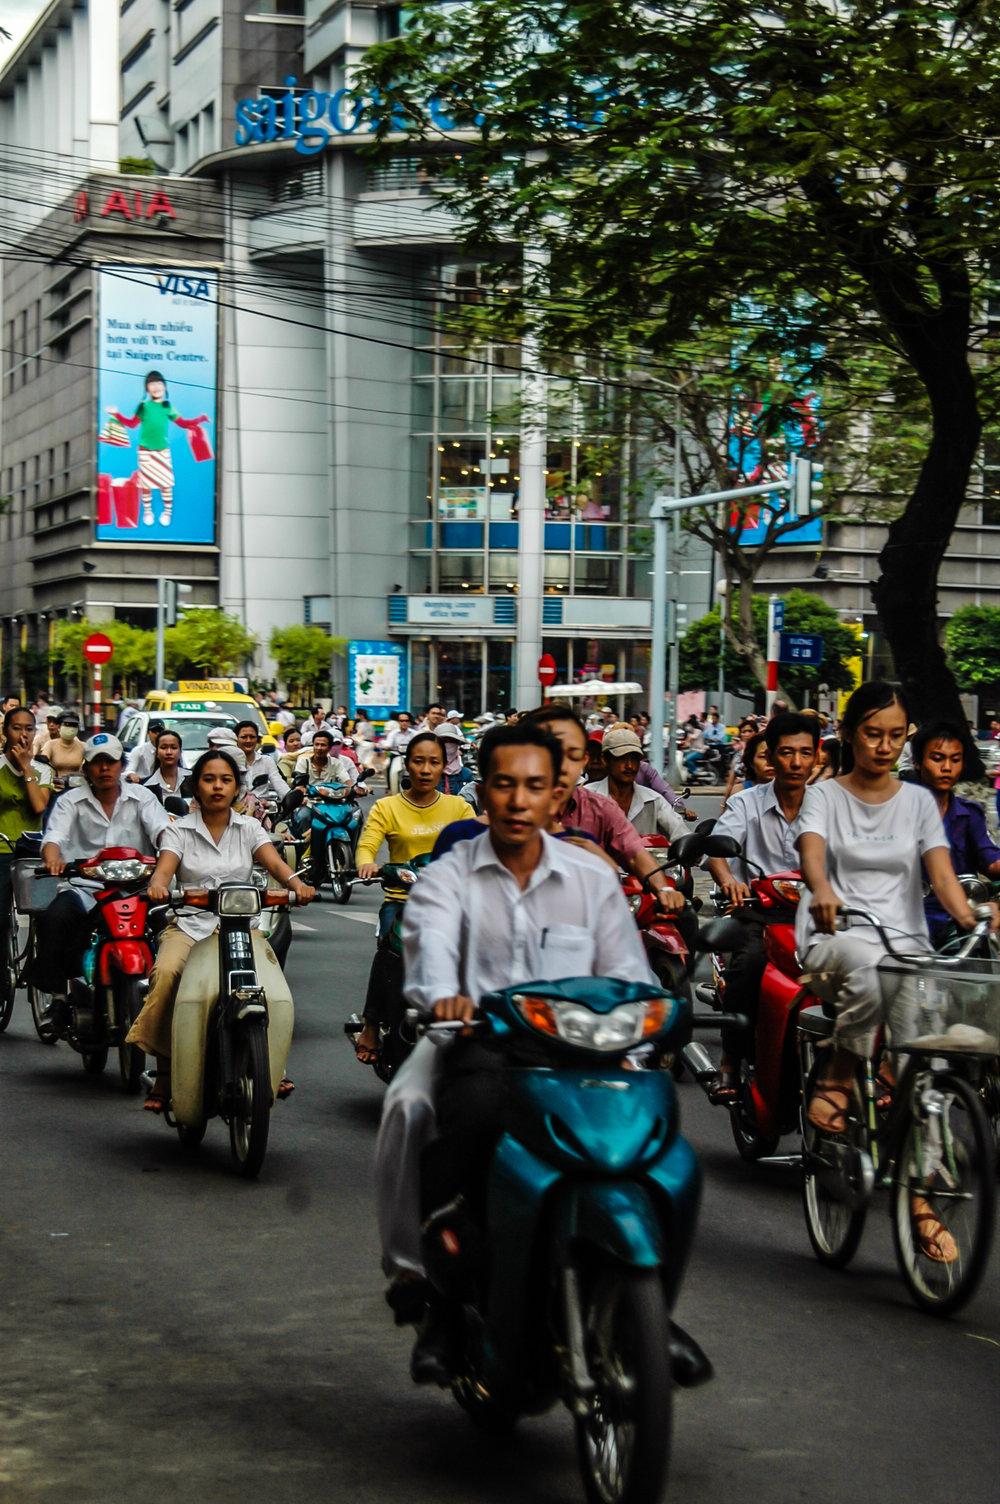 PeopleofVietnam-127.jpg